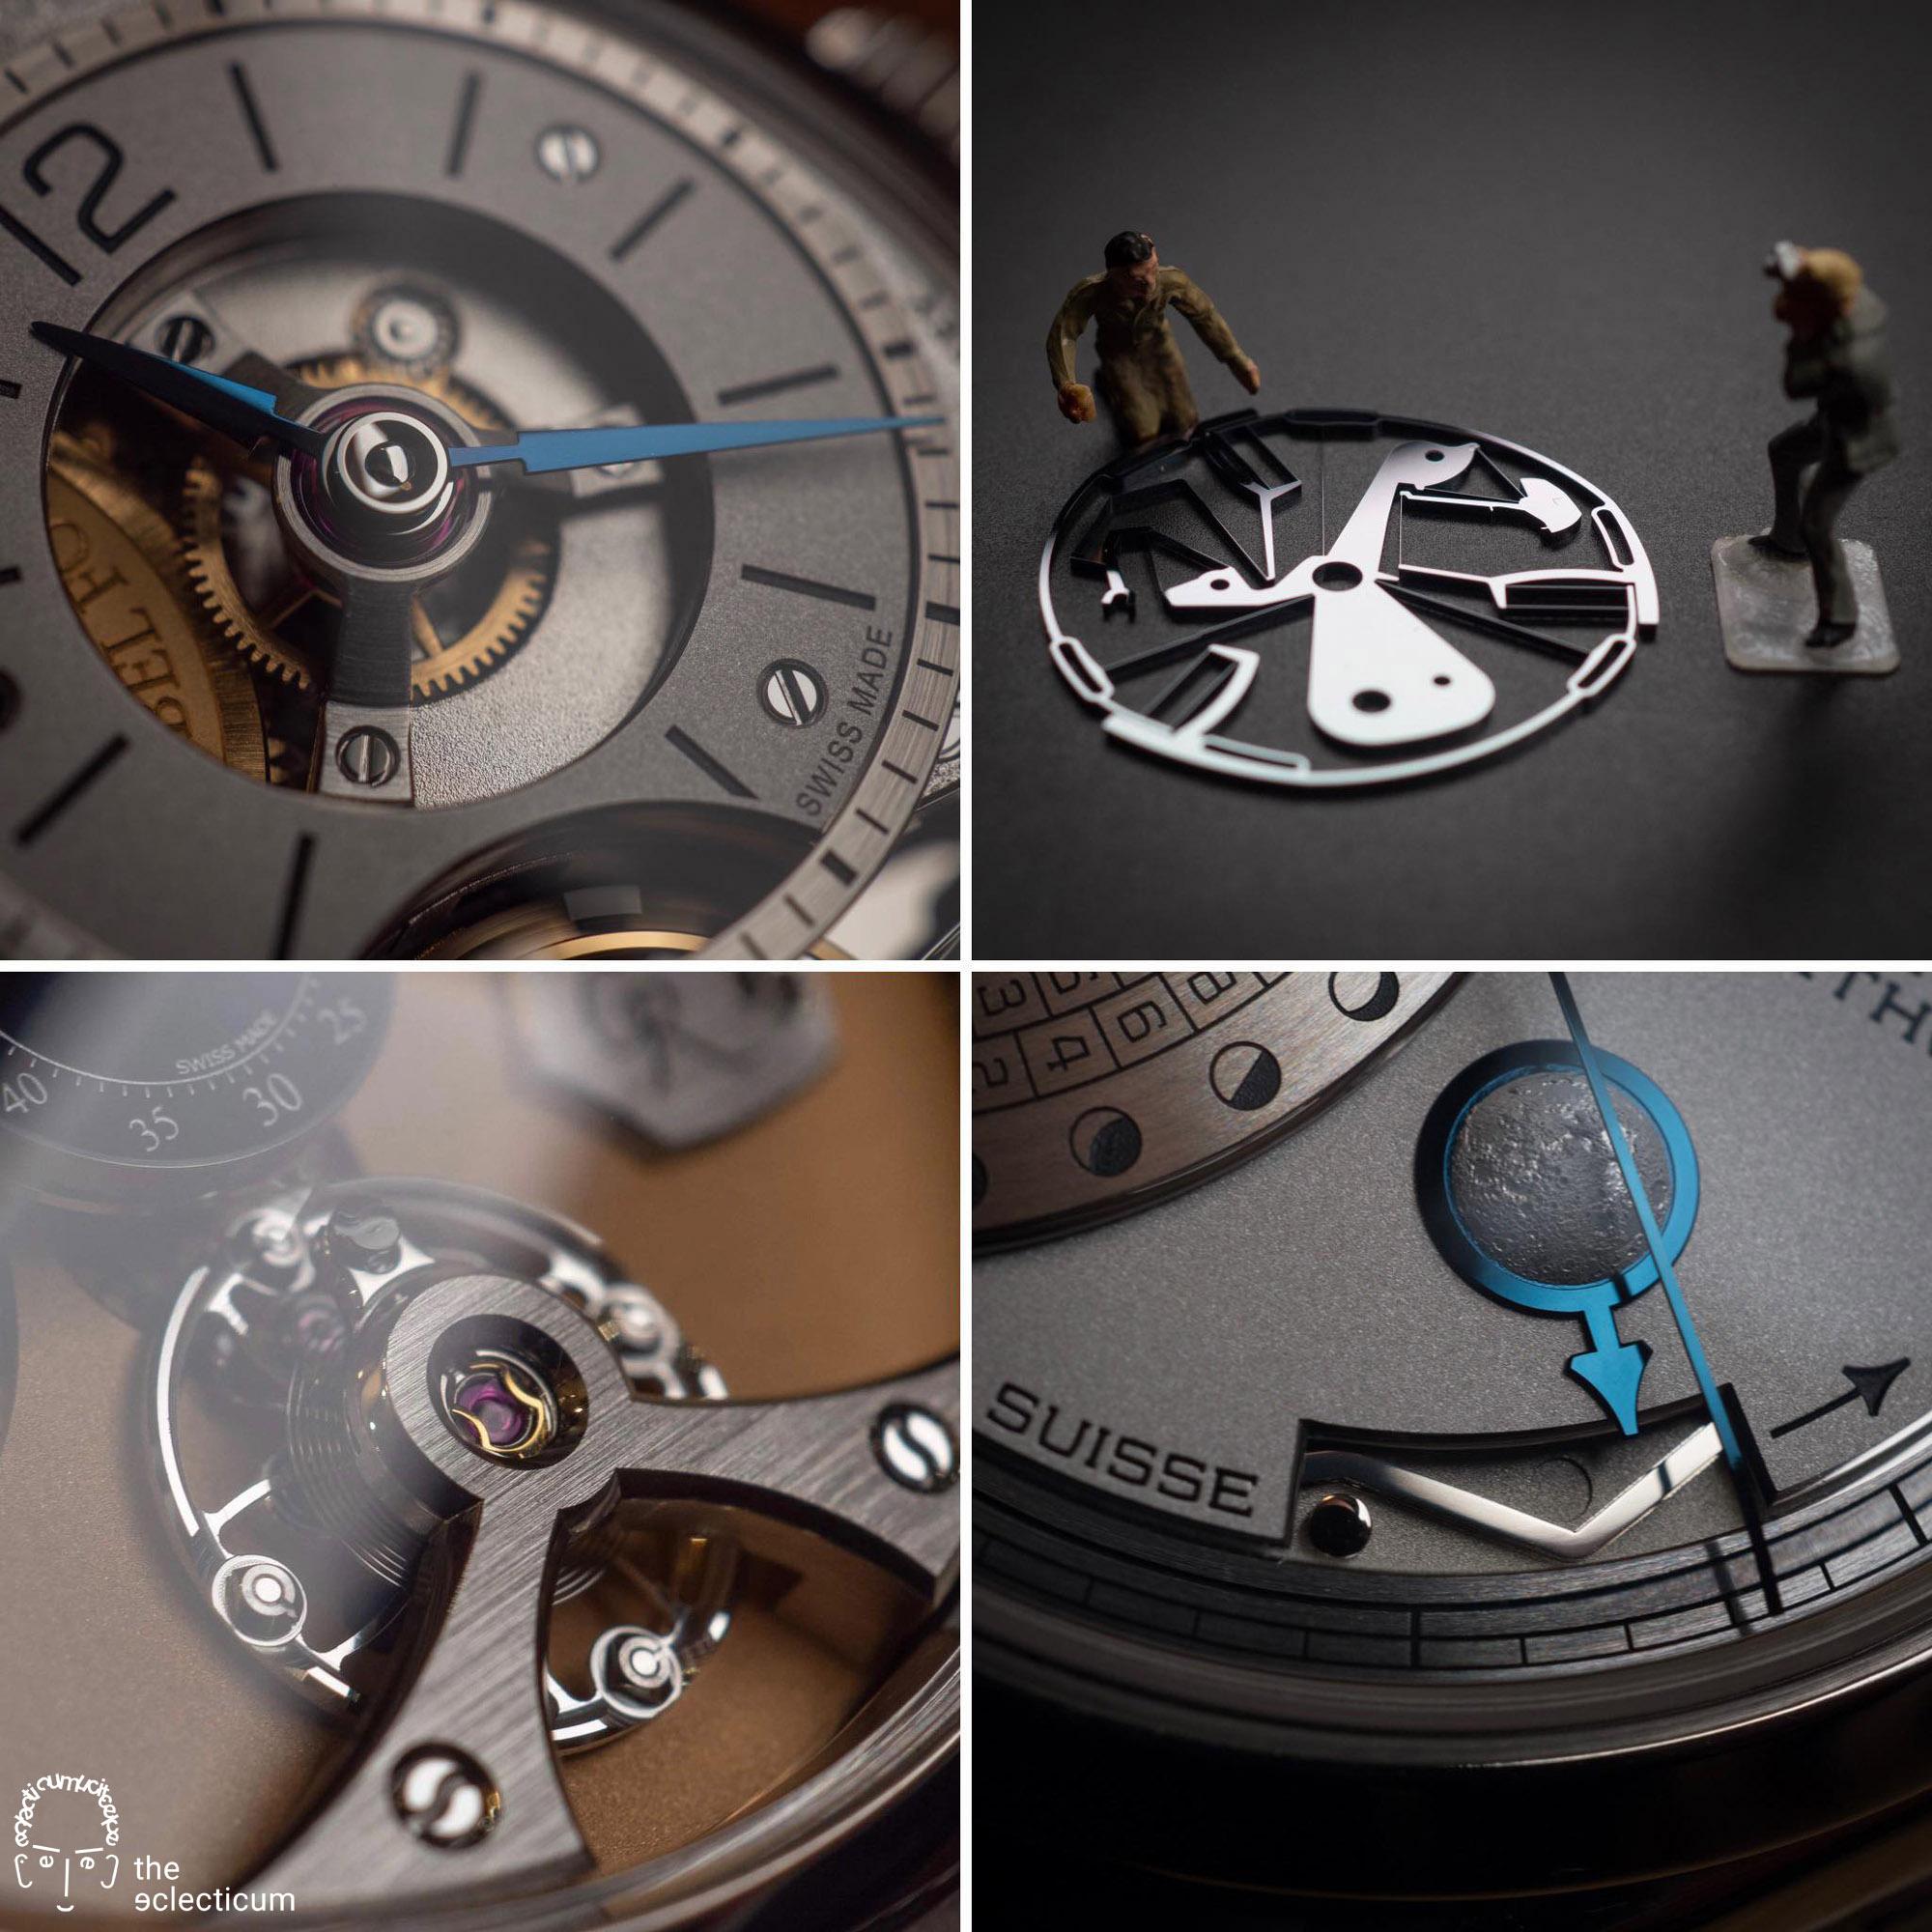 fine watchmaking Ferdinand Berthoud Romain Gauthier Zenith Greubel Forsey silicon finishing